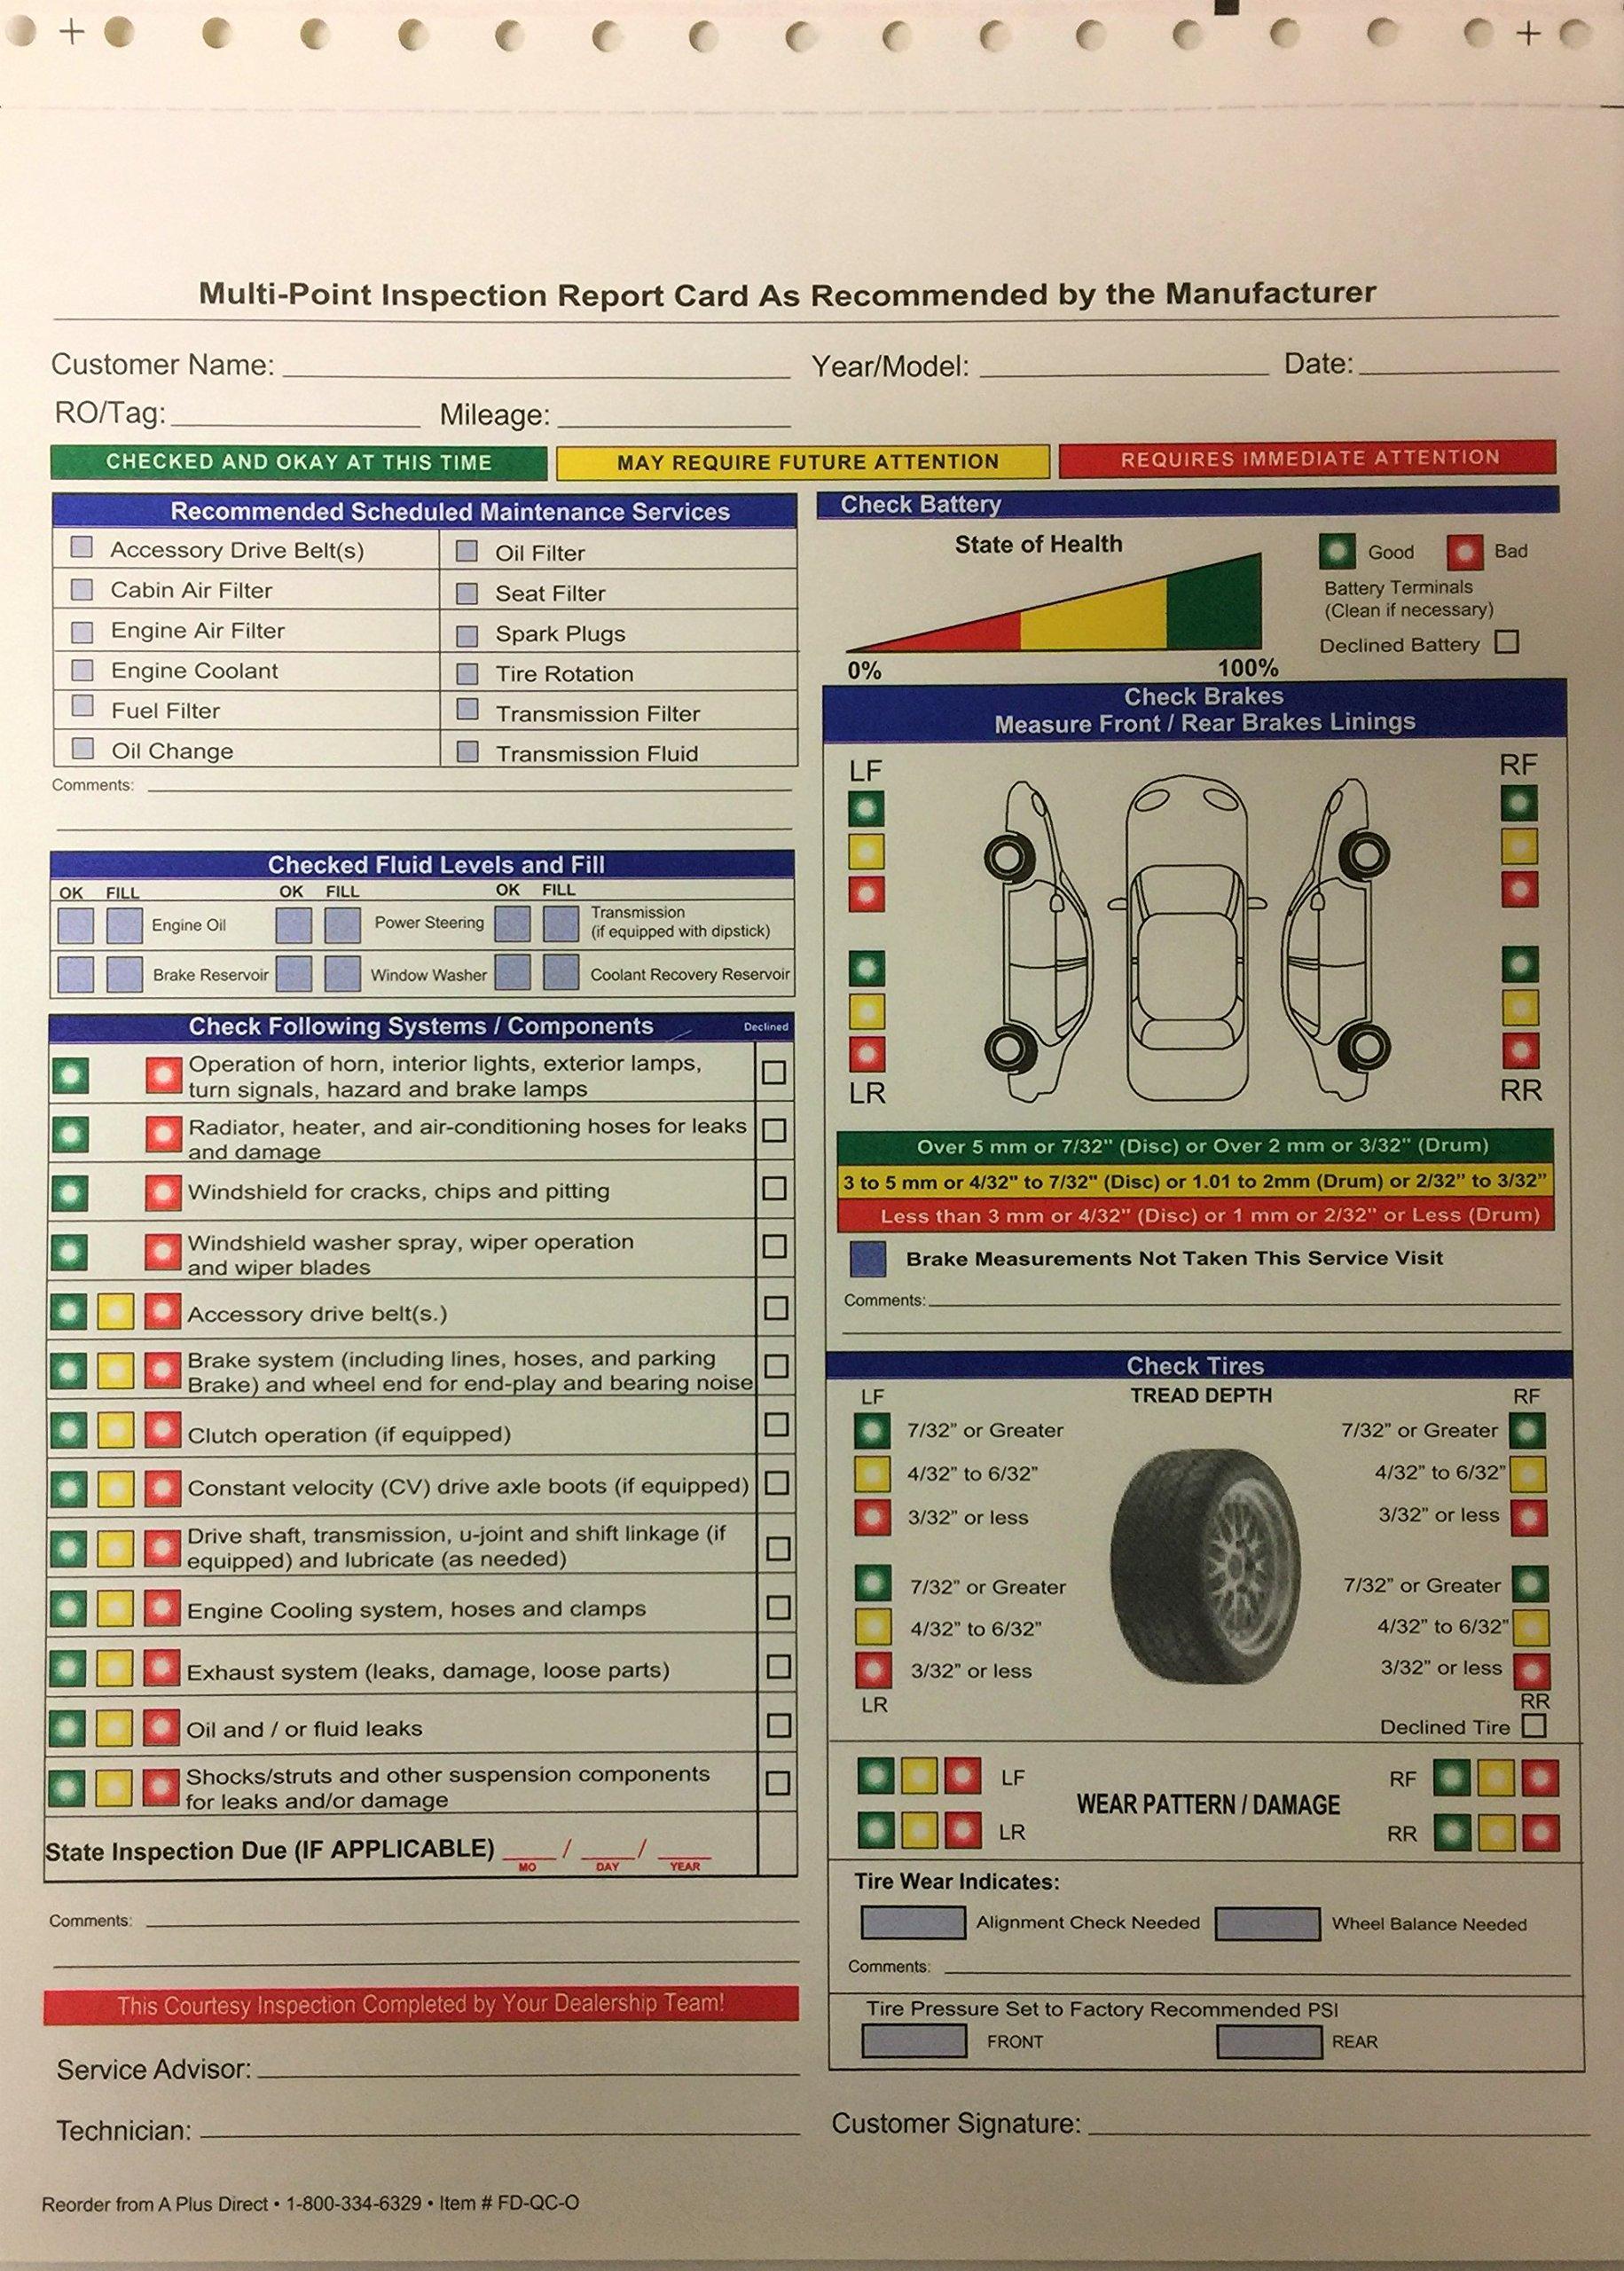 Auto Repair Multi Point Inspection Forms (2 Part NCR,) Quantity 500 (P8)